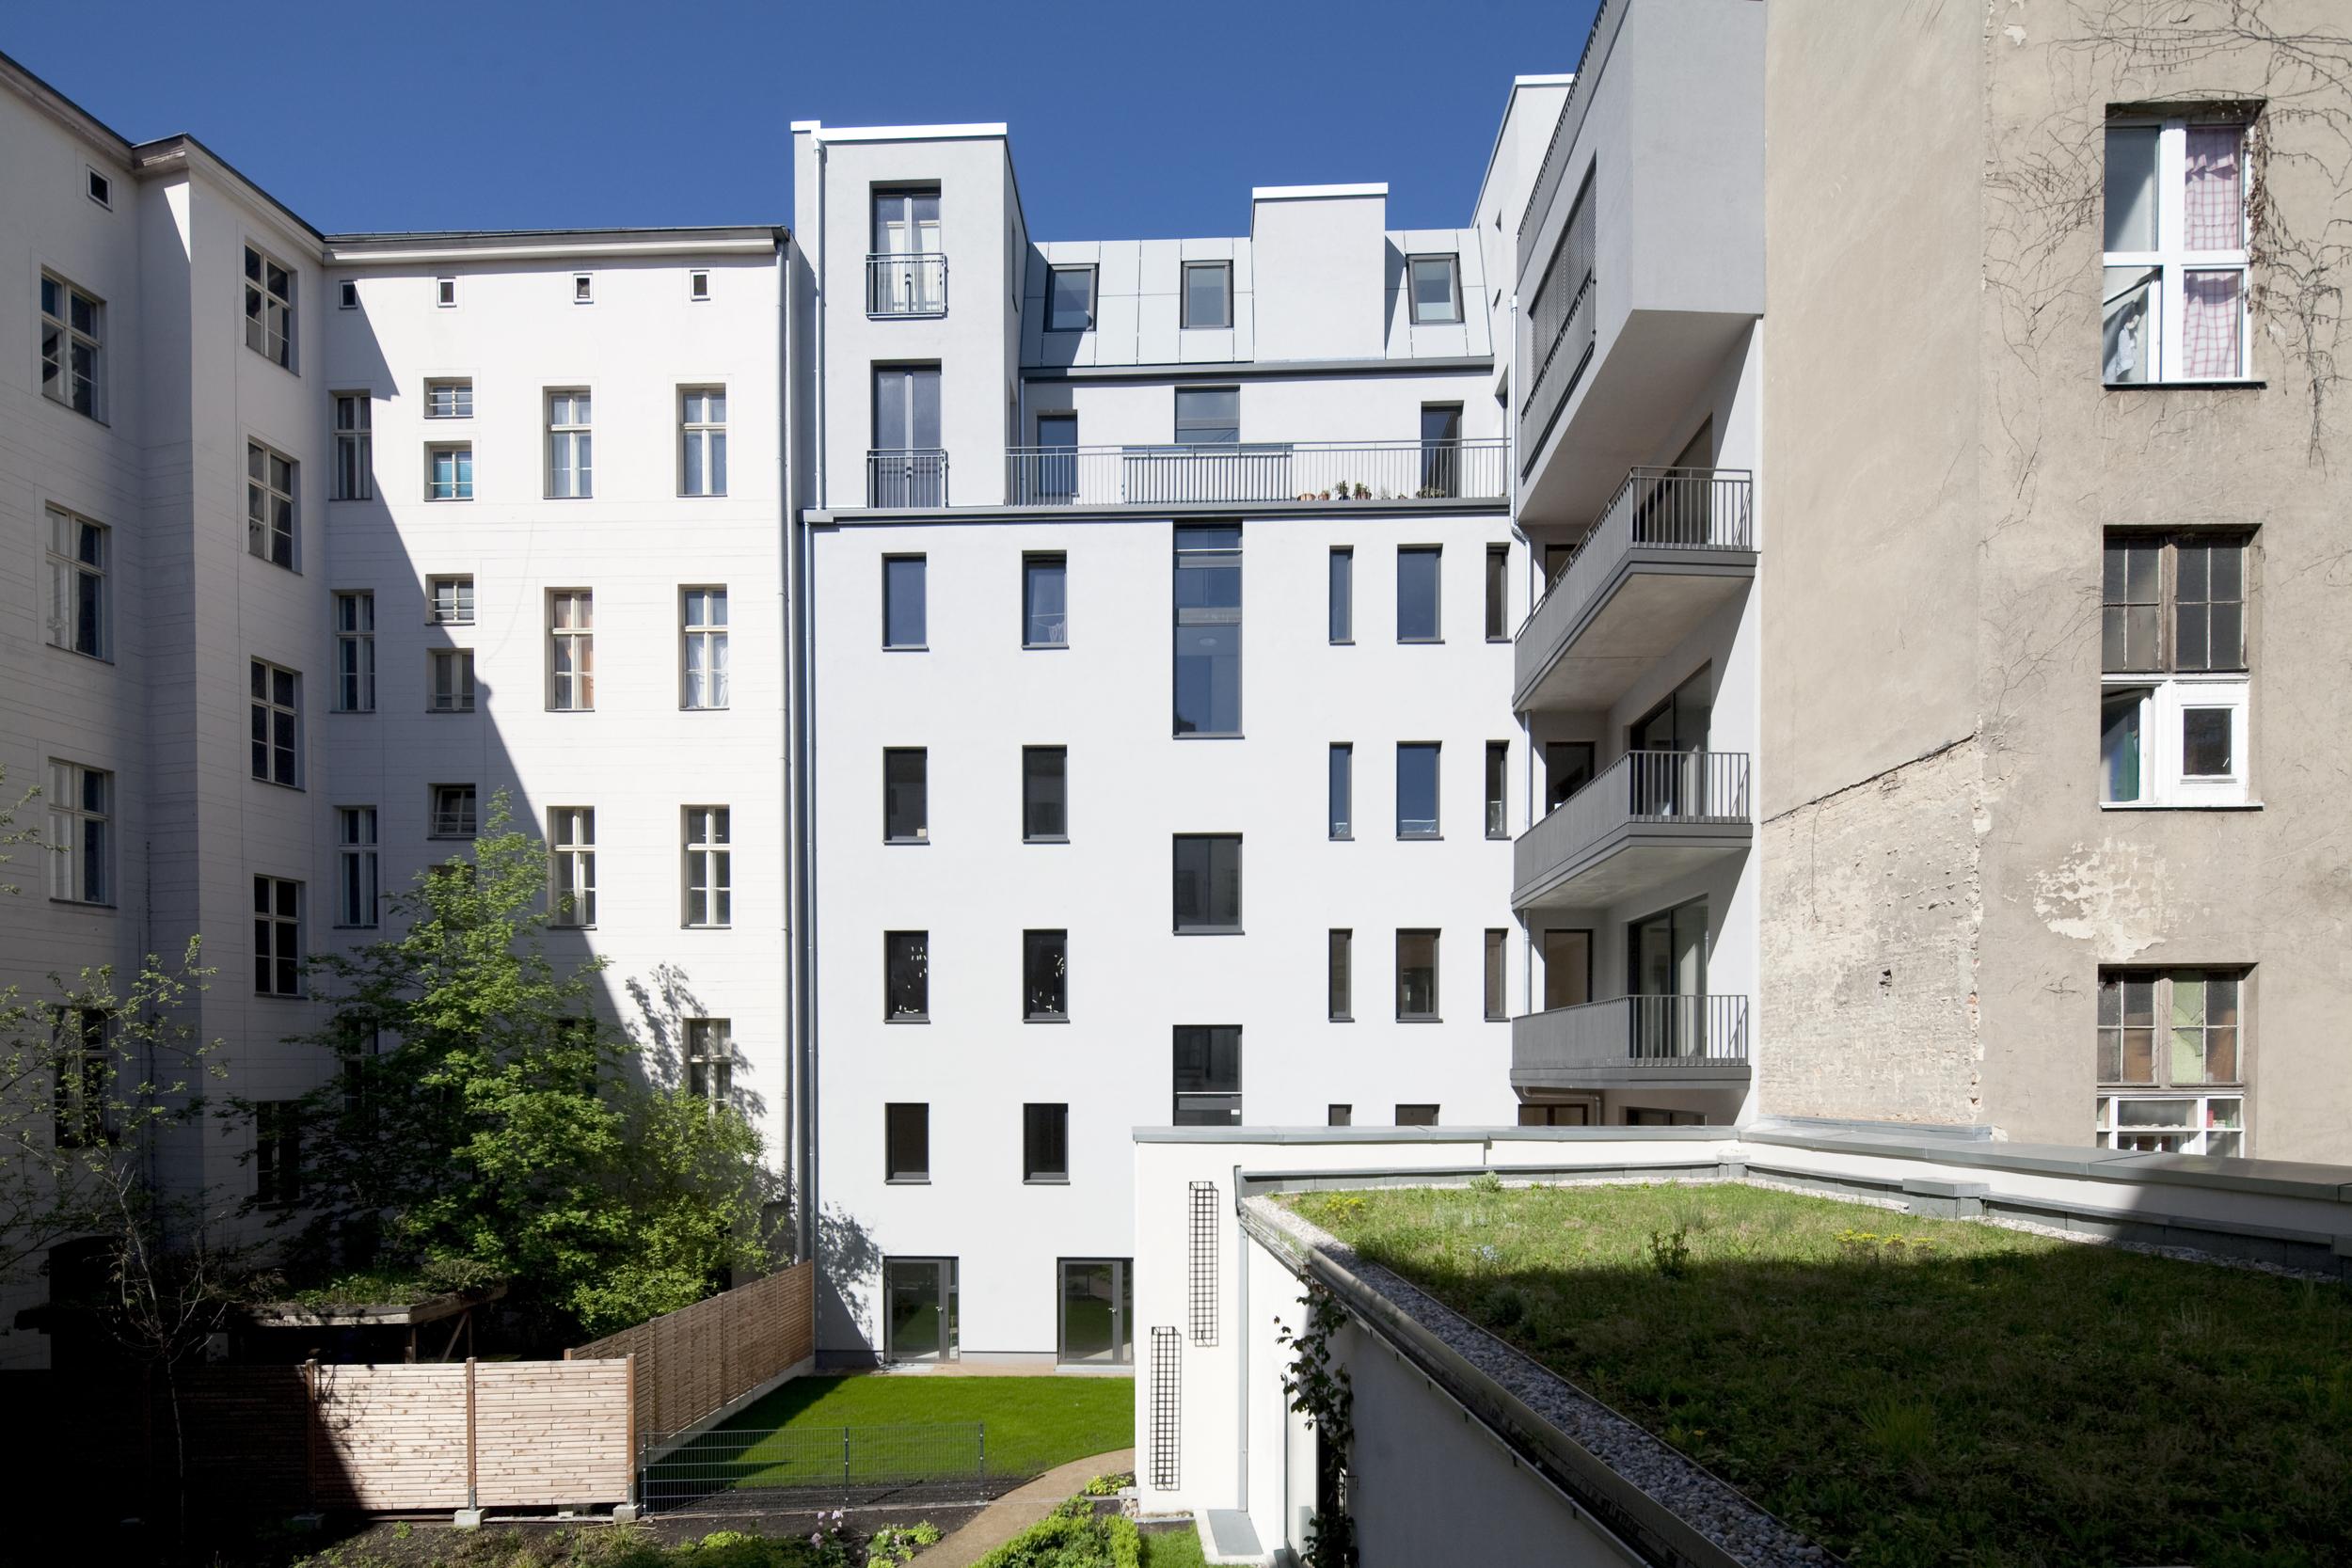 Private apartmenthouse, Kluckstraße, Berlin,